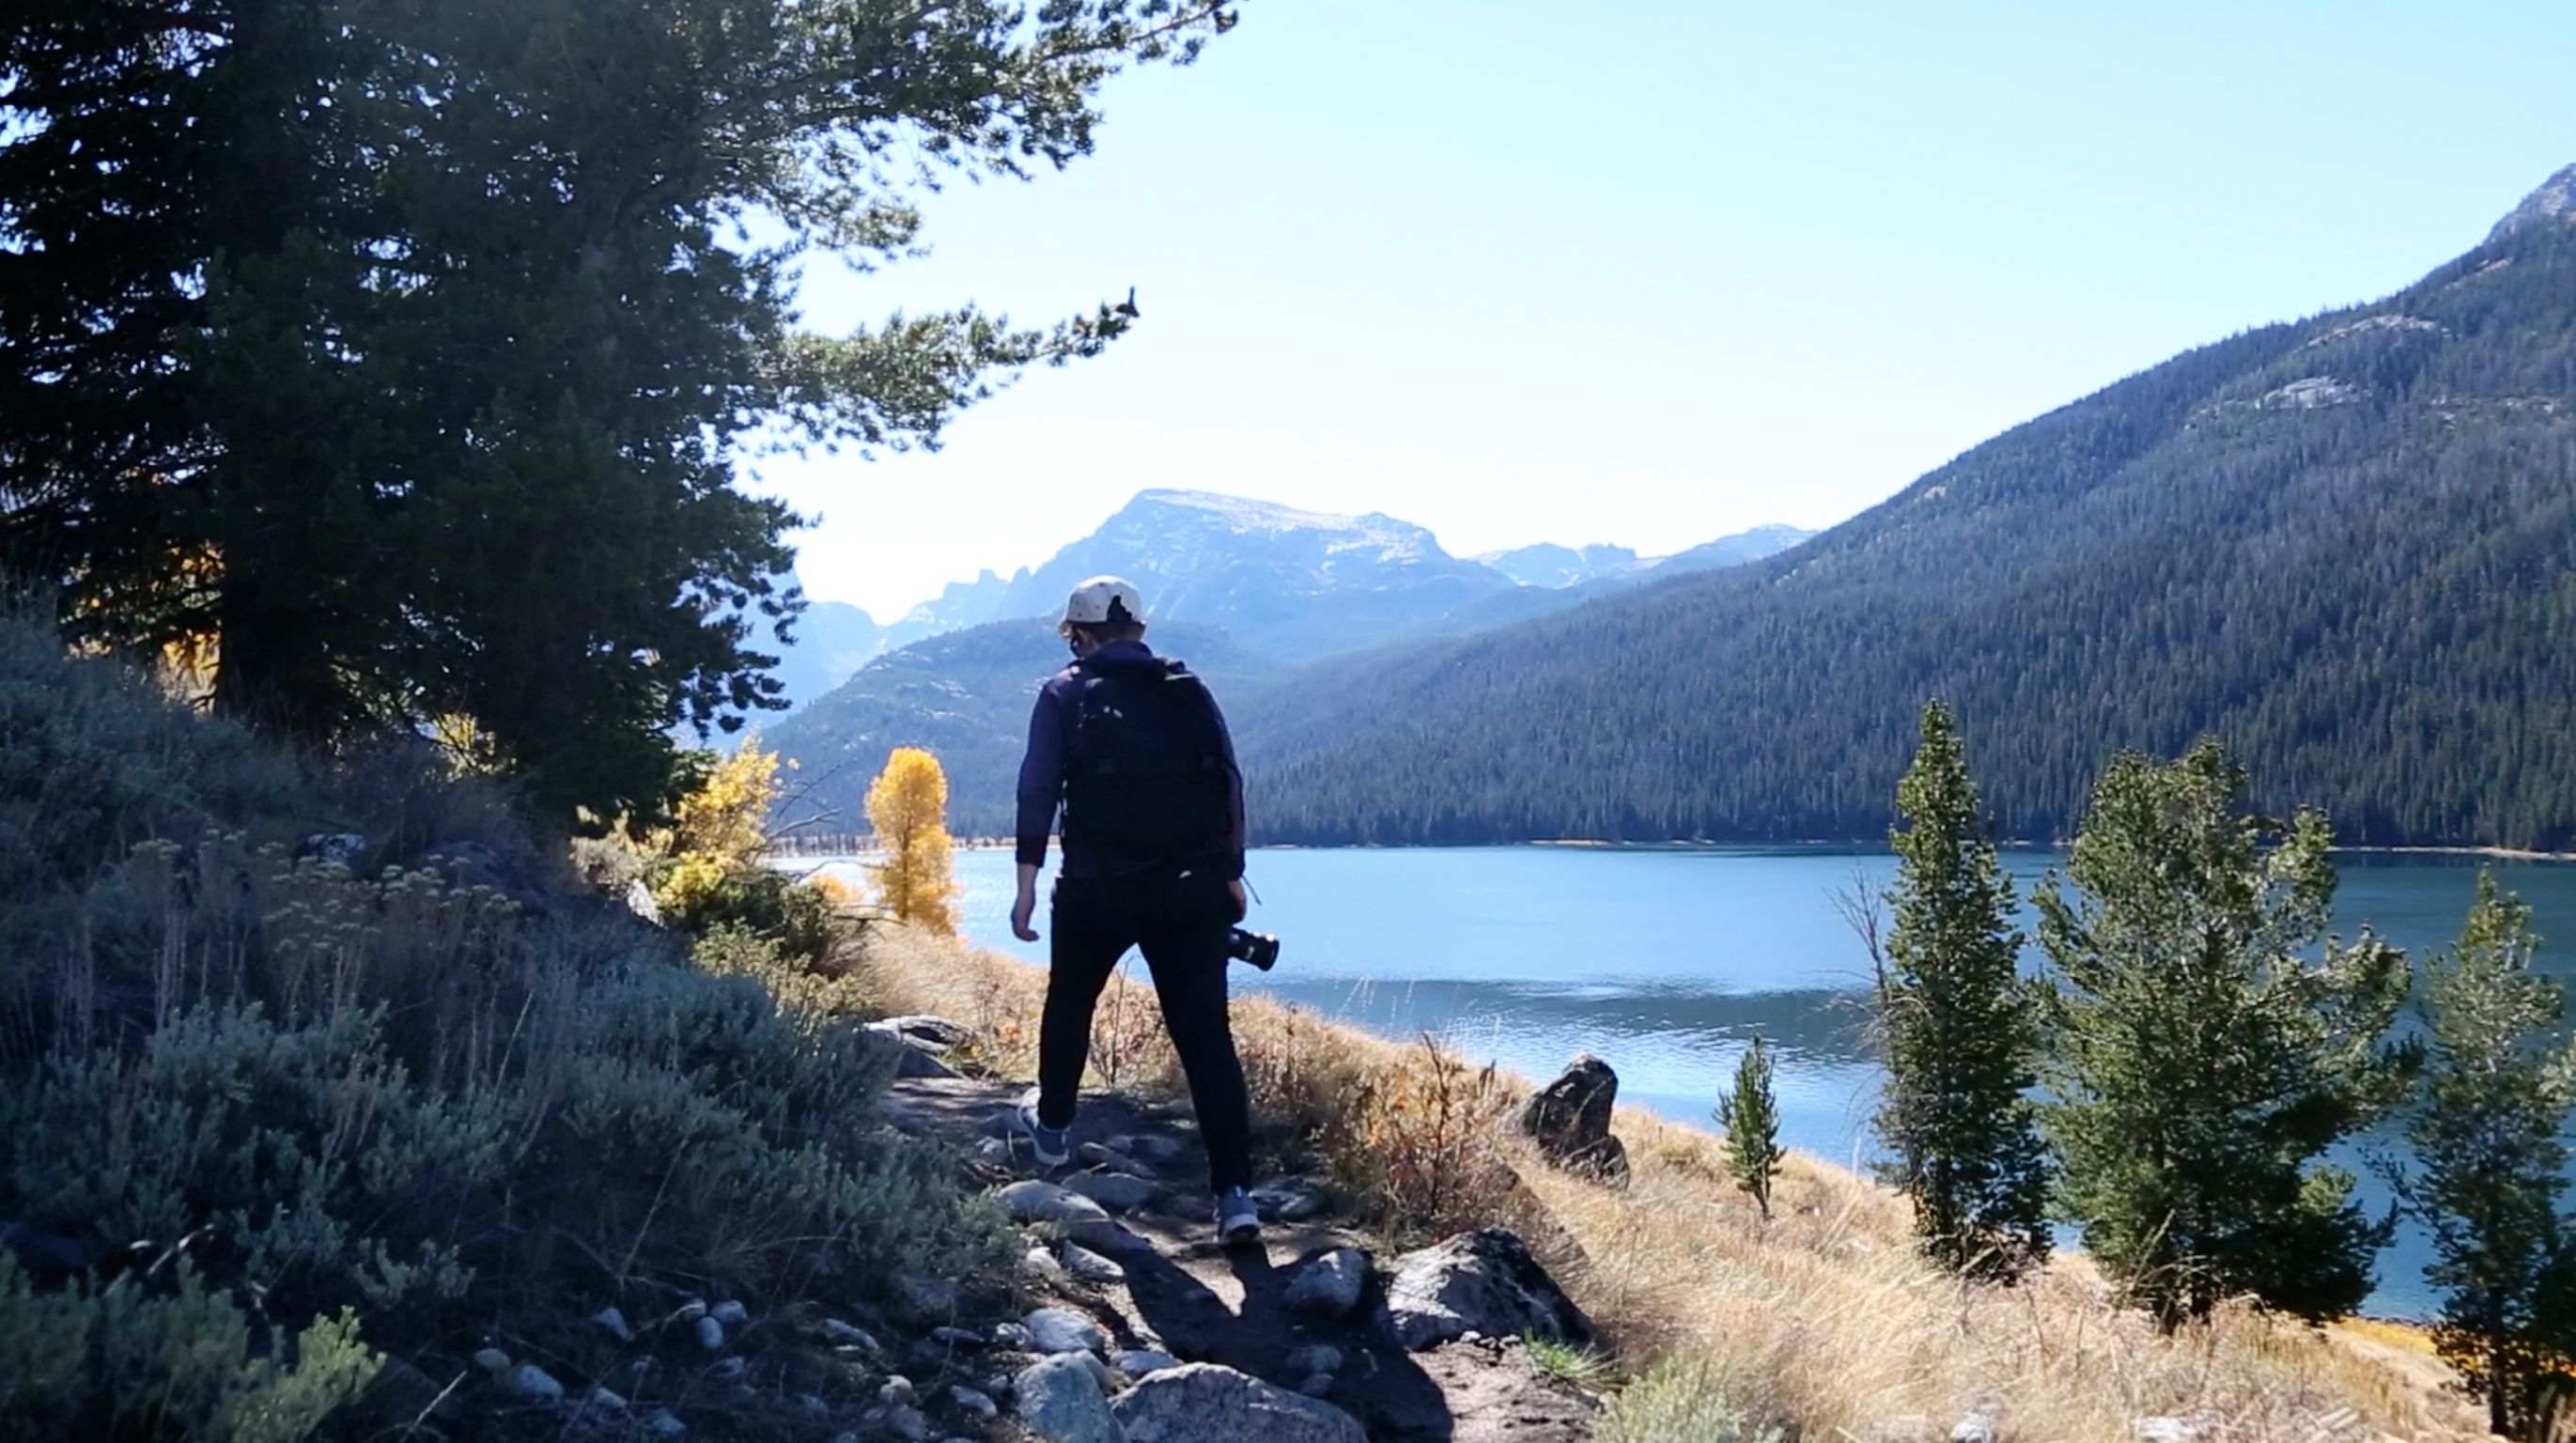 In search of Forrest Fenn's treasure